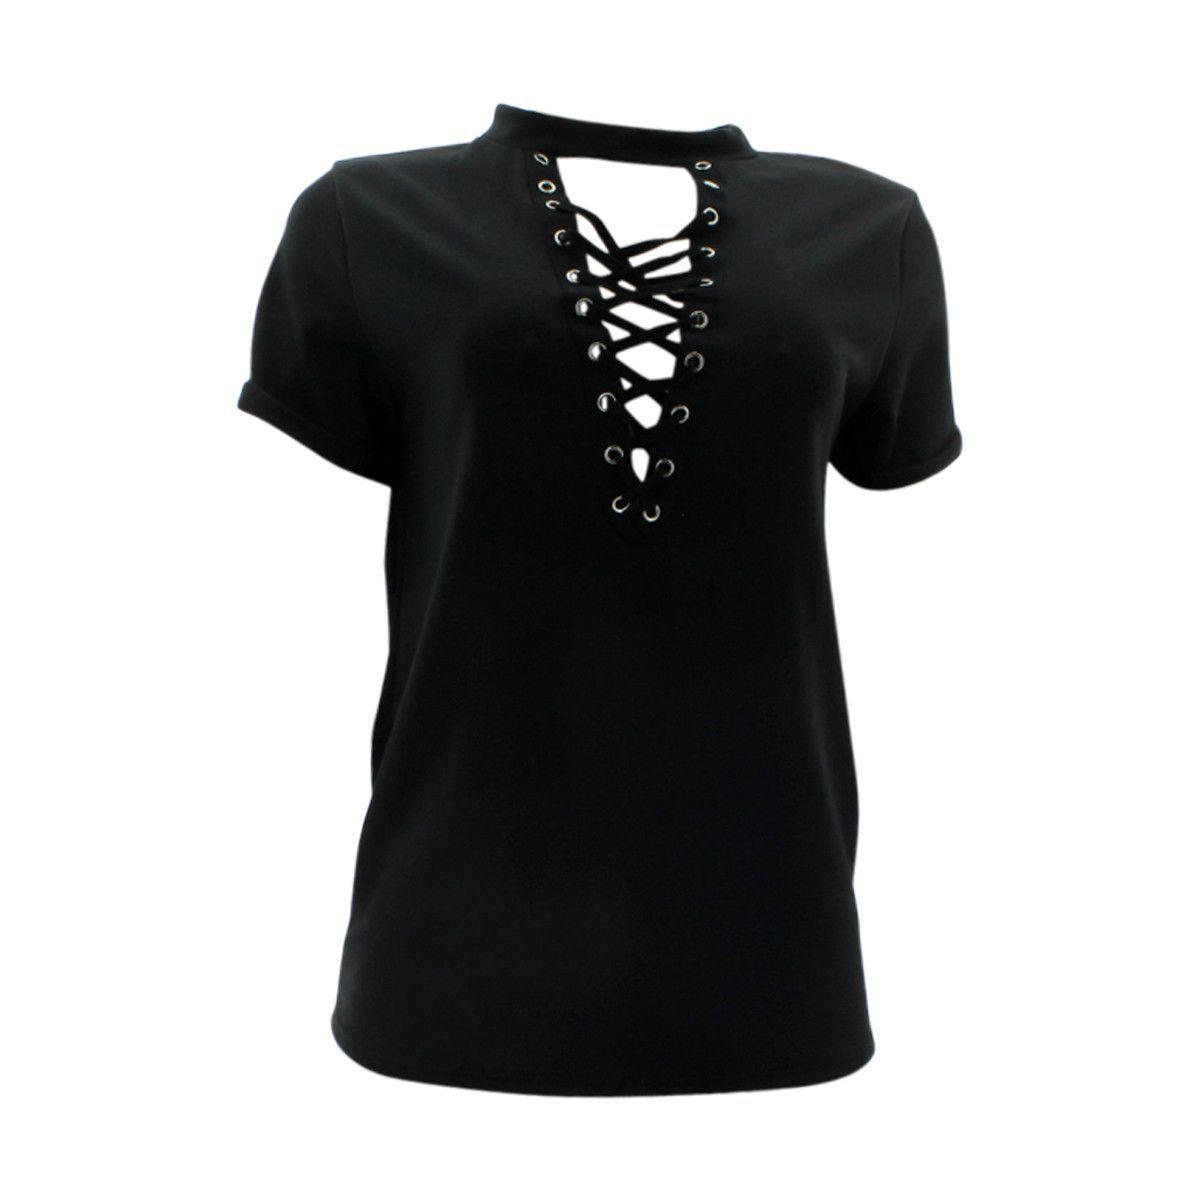 Fashion Magazine - Women's Short Sleeves Tie Up Choker Neck Top - Black